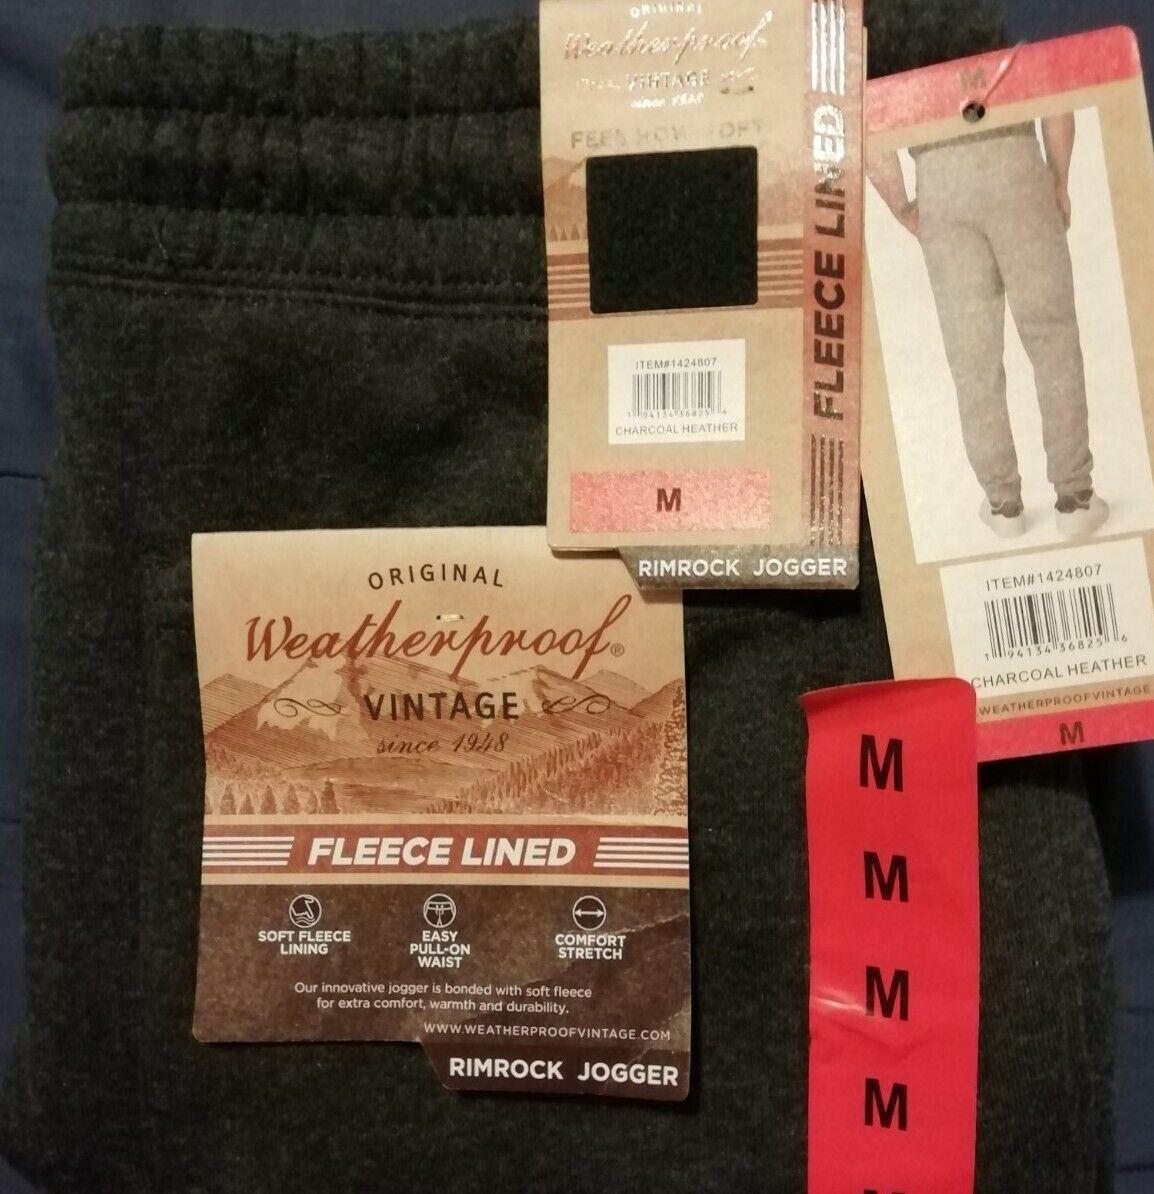 ! oferta! resistente a la intemperie de chándal para hombre forro polar. cálido y de moda. M/H. 👌 gris.